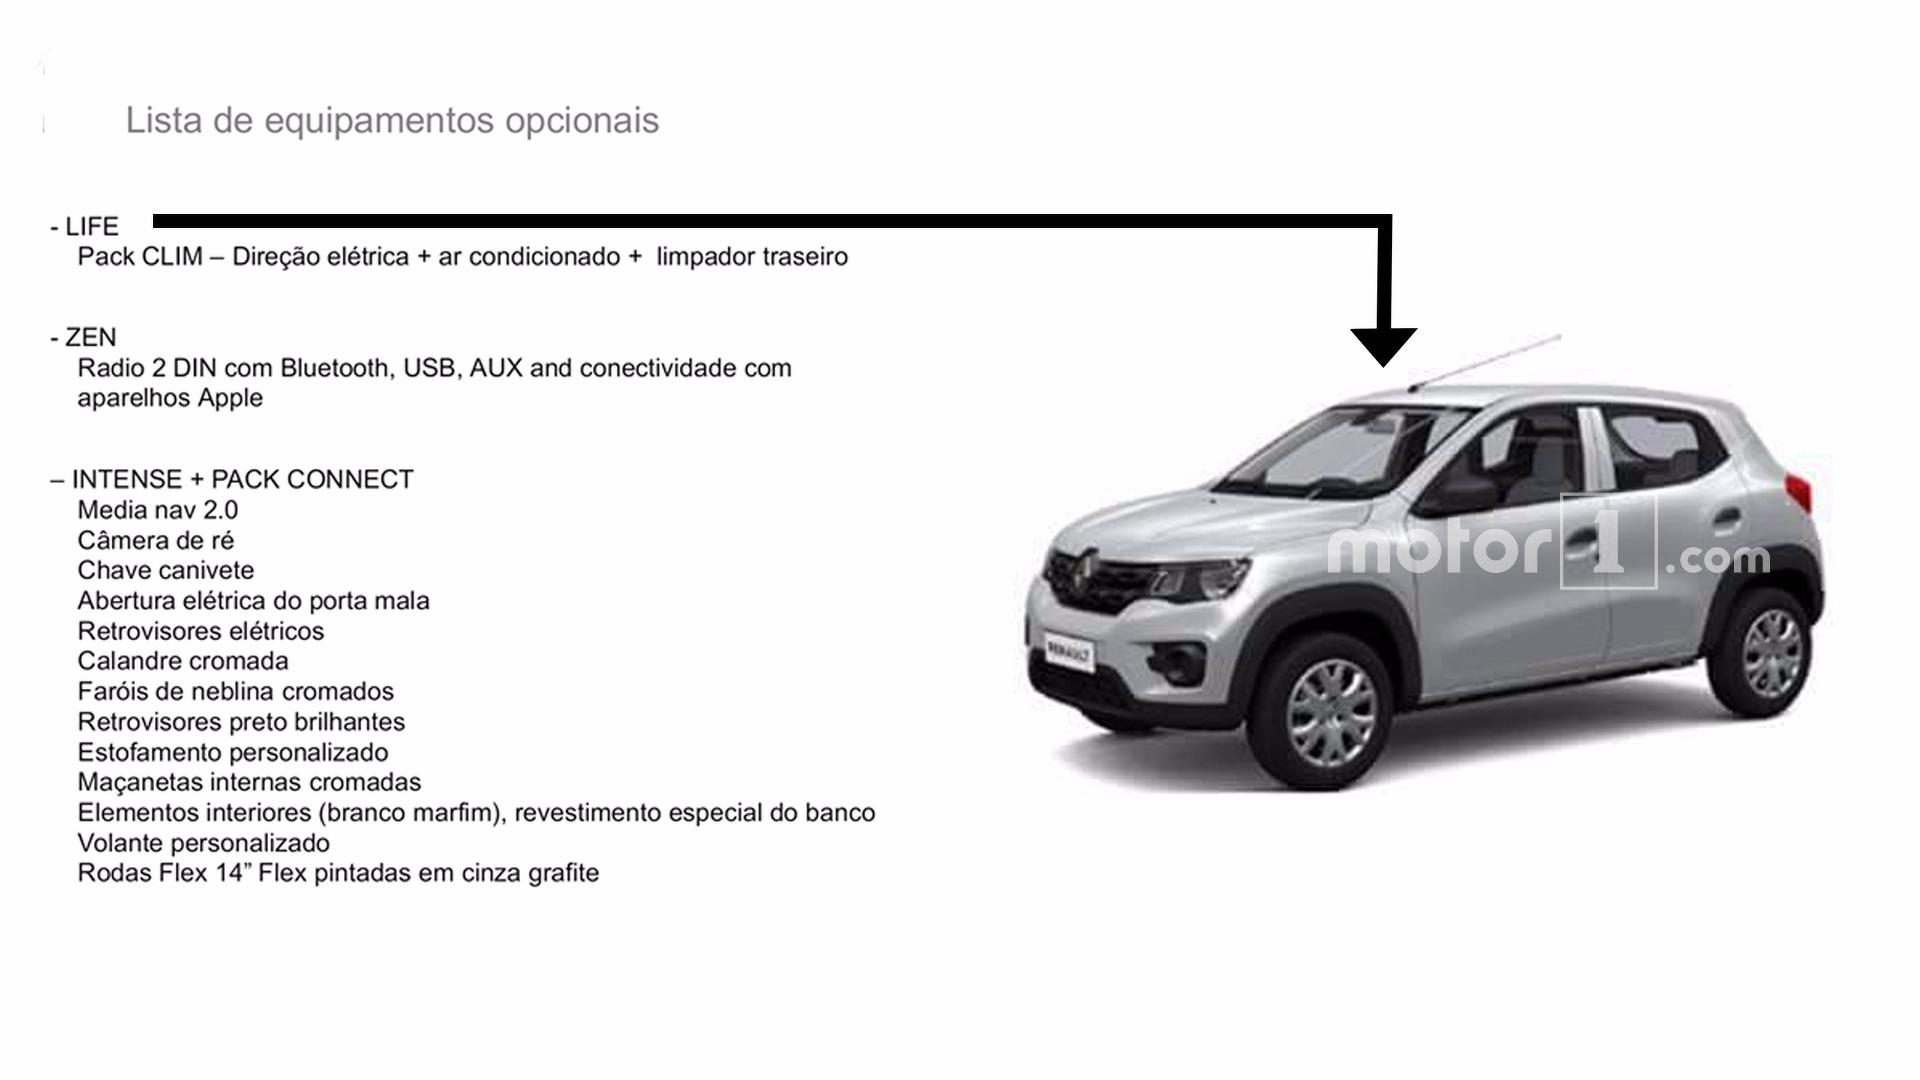 Opcionales Equipamiento Renault Kwid